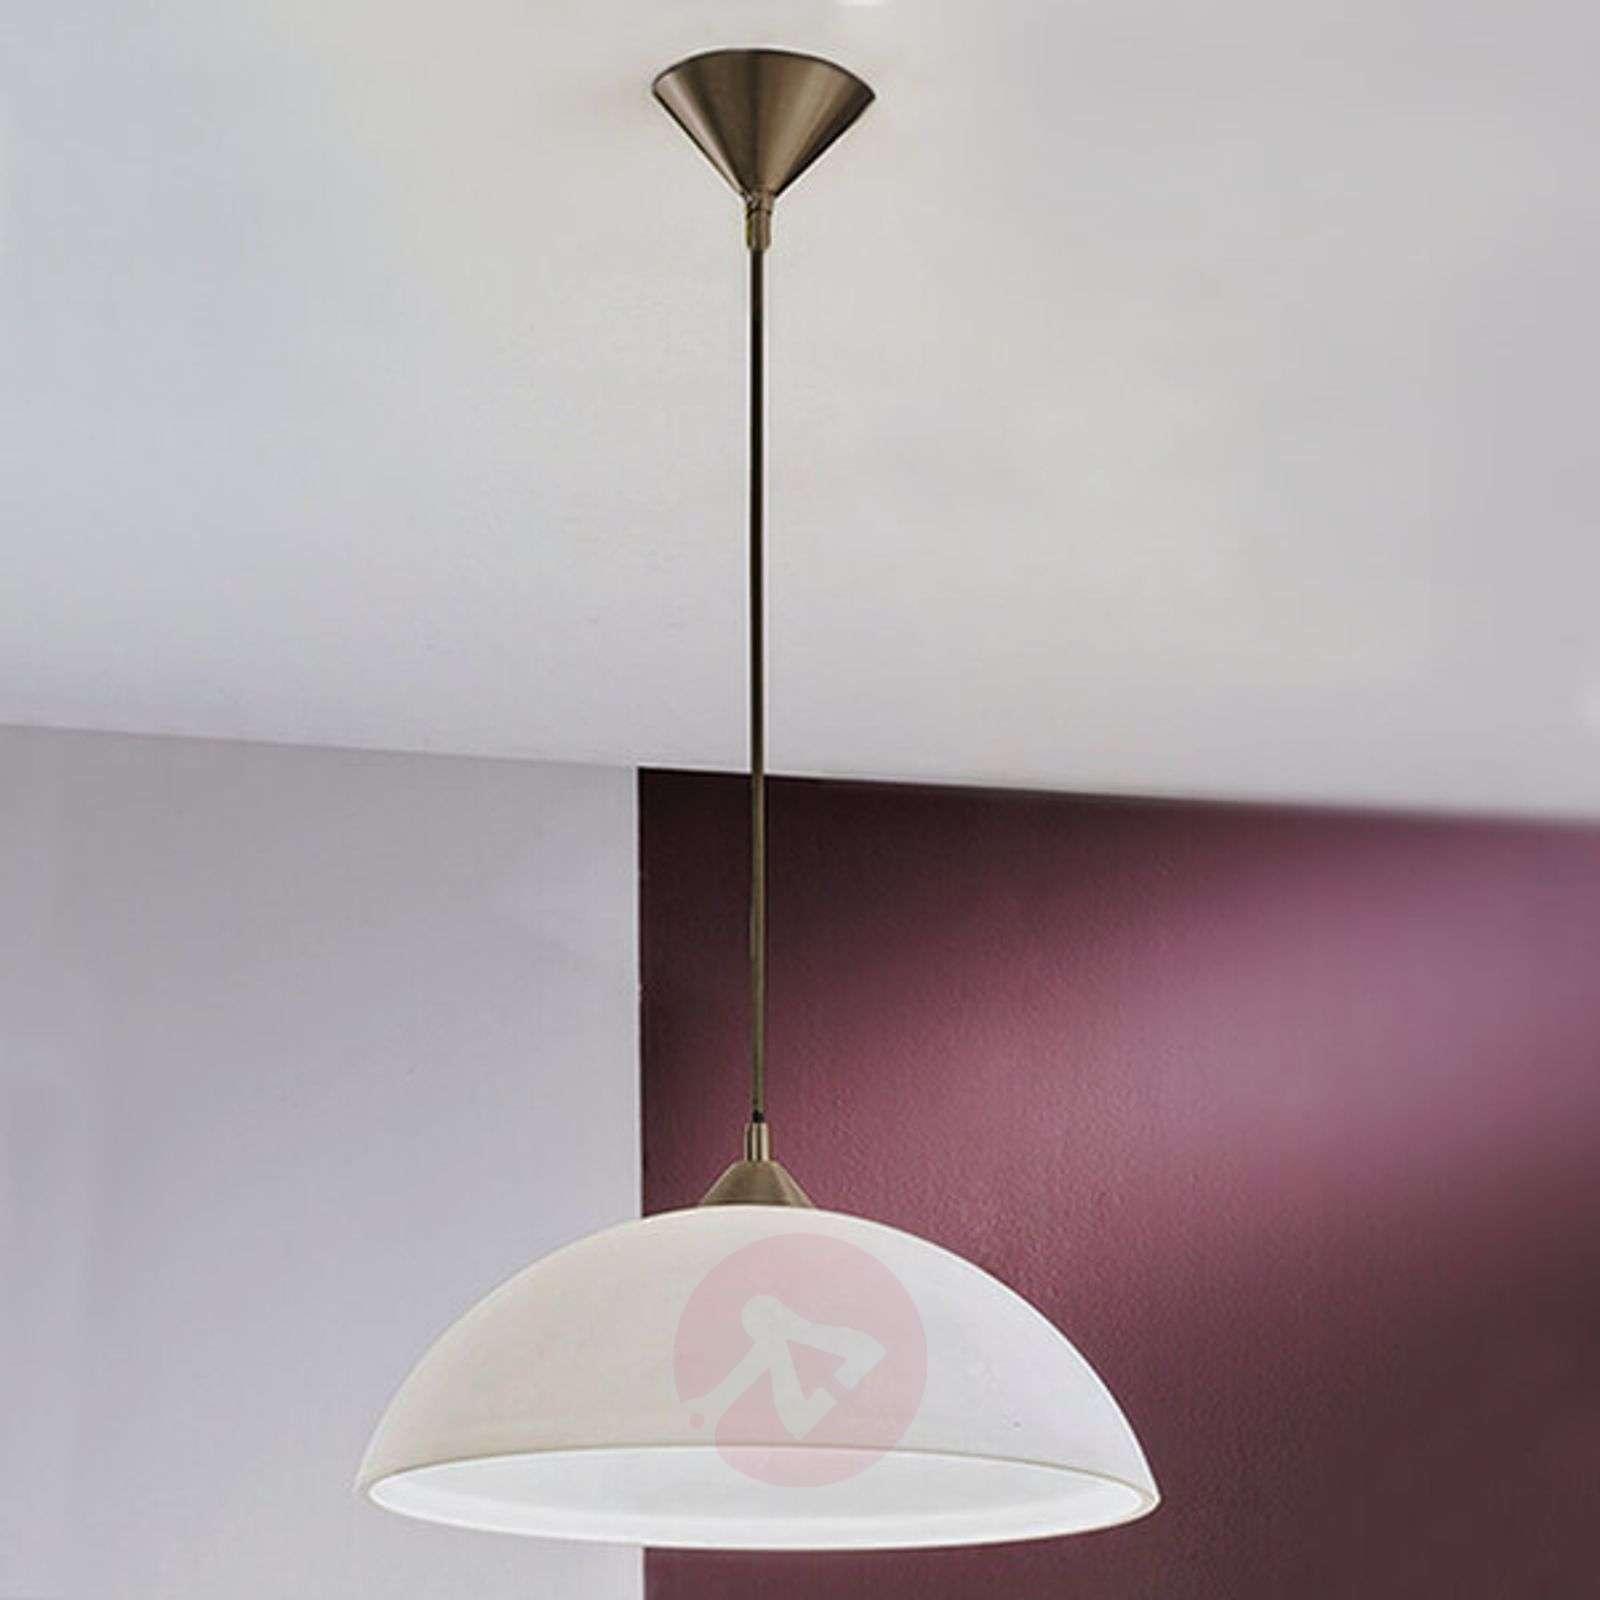 Simple hanging light Kinga, opal glass lampshade-7255343-01